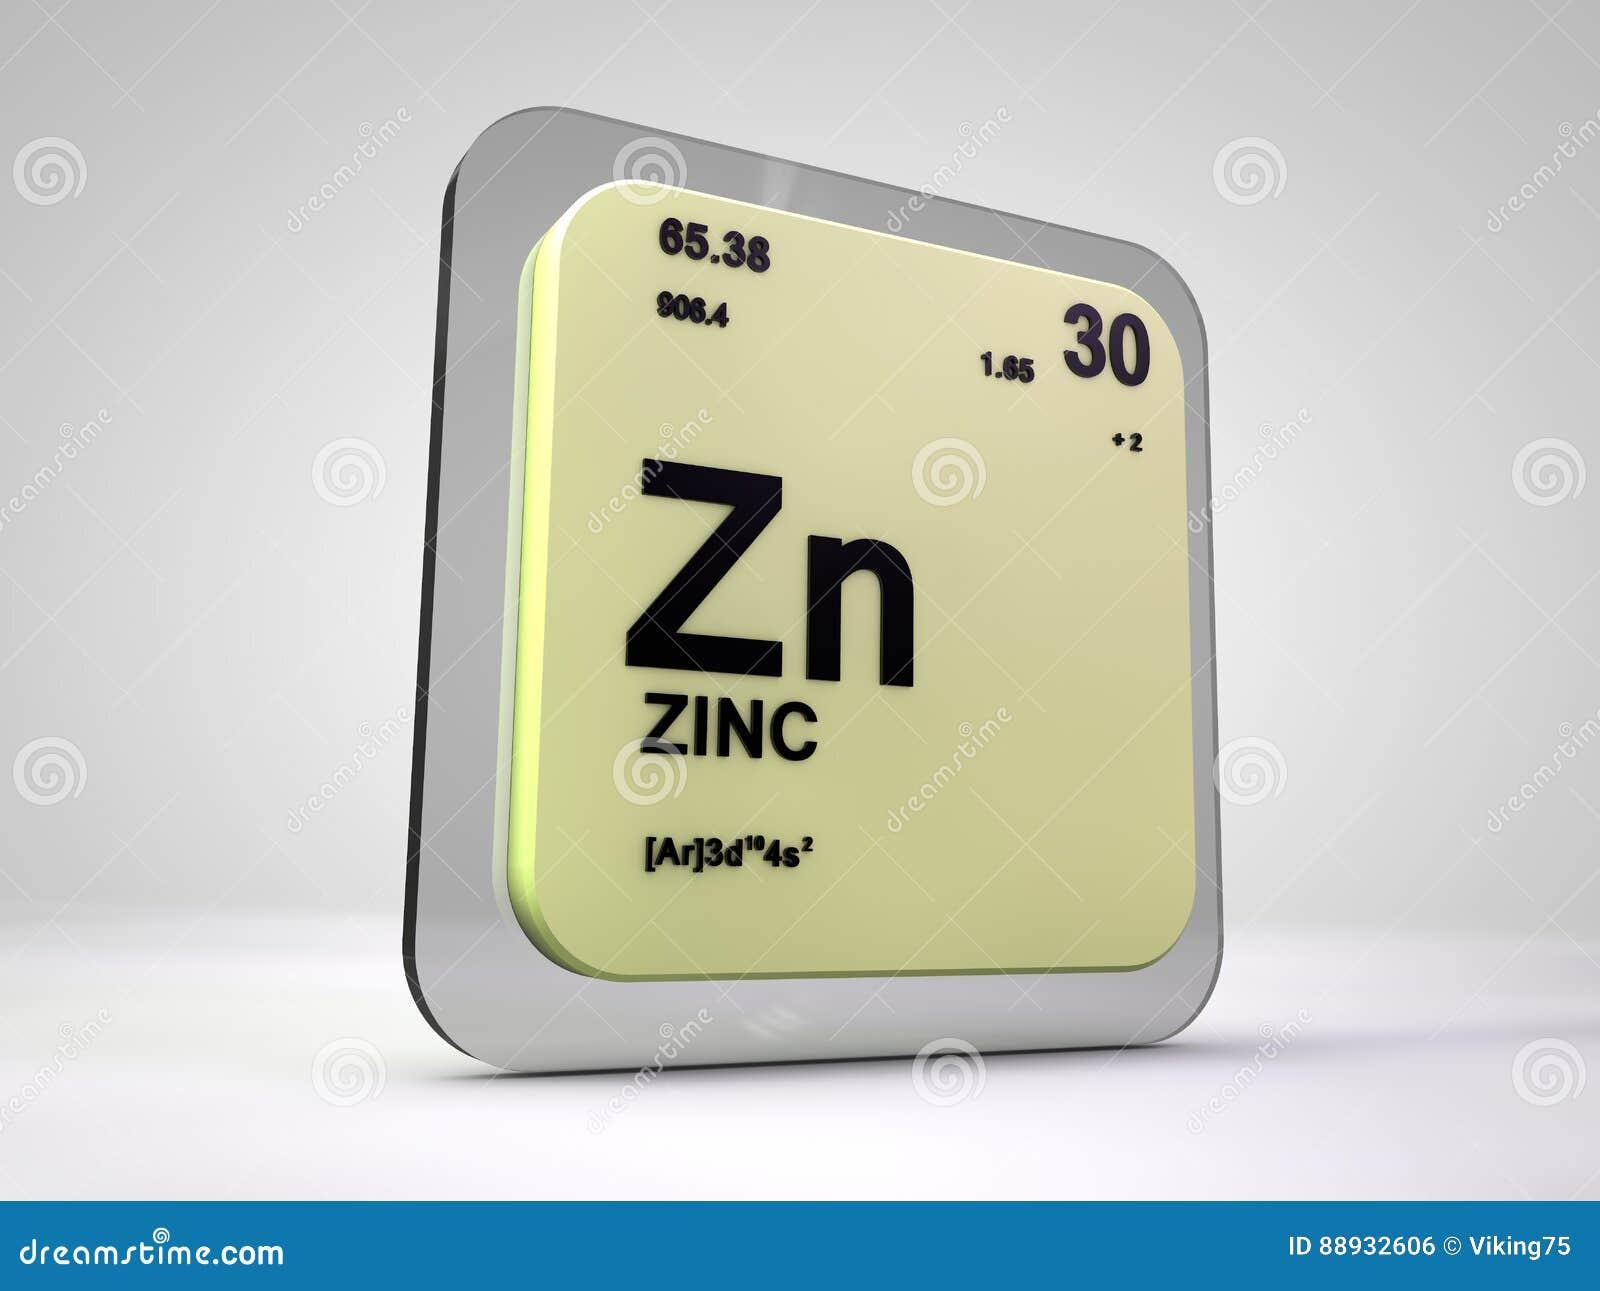 Cinc zn tabla peridica del elemento qumico stock de cinc zn tabla peridica del elemento qumico urtaz Images